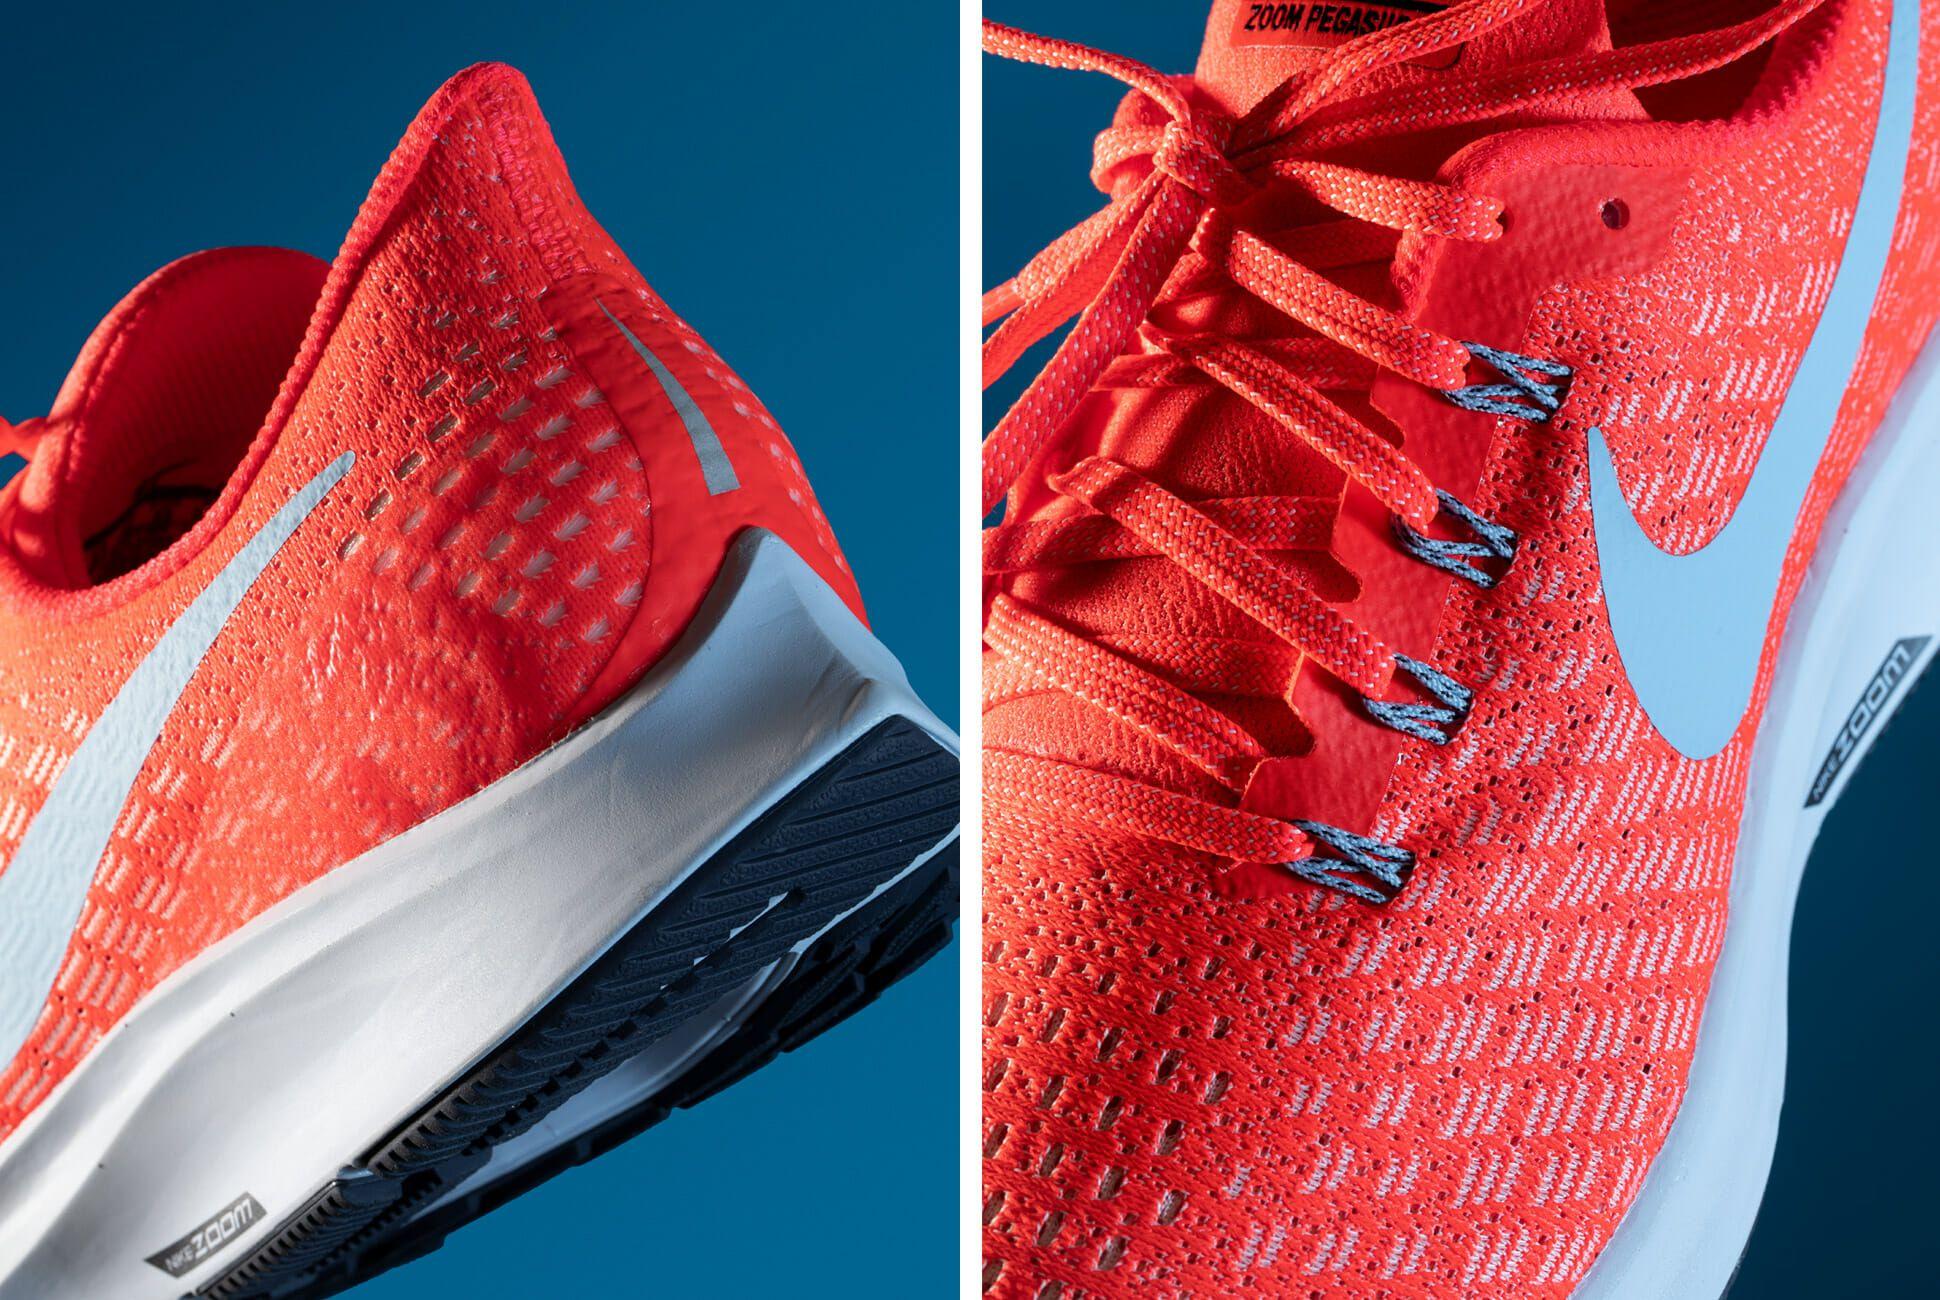 Nike Air Pegasus 35 Review: One of the